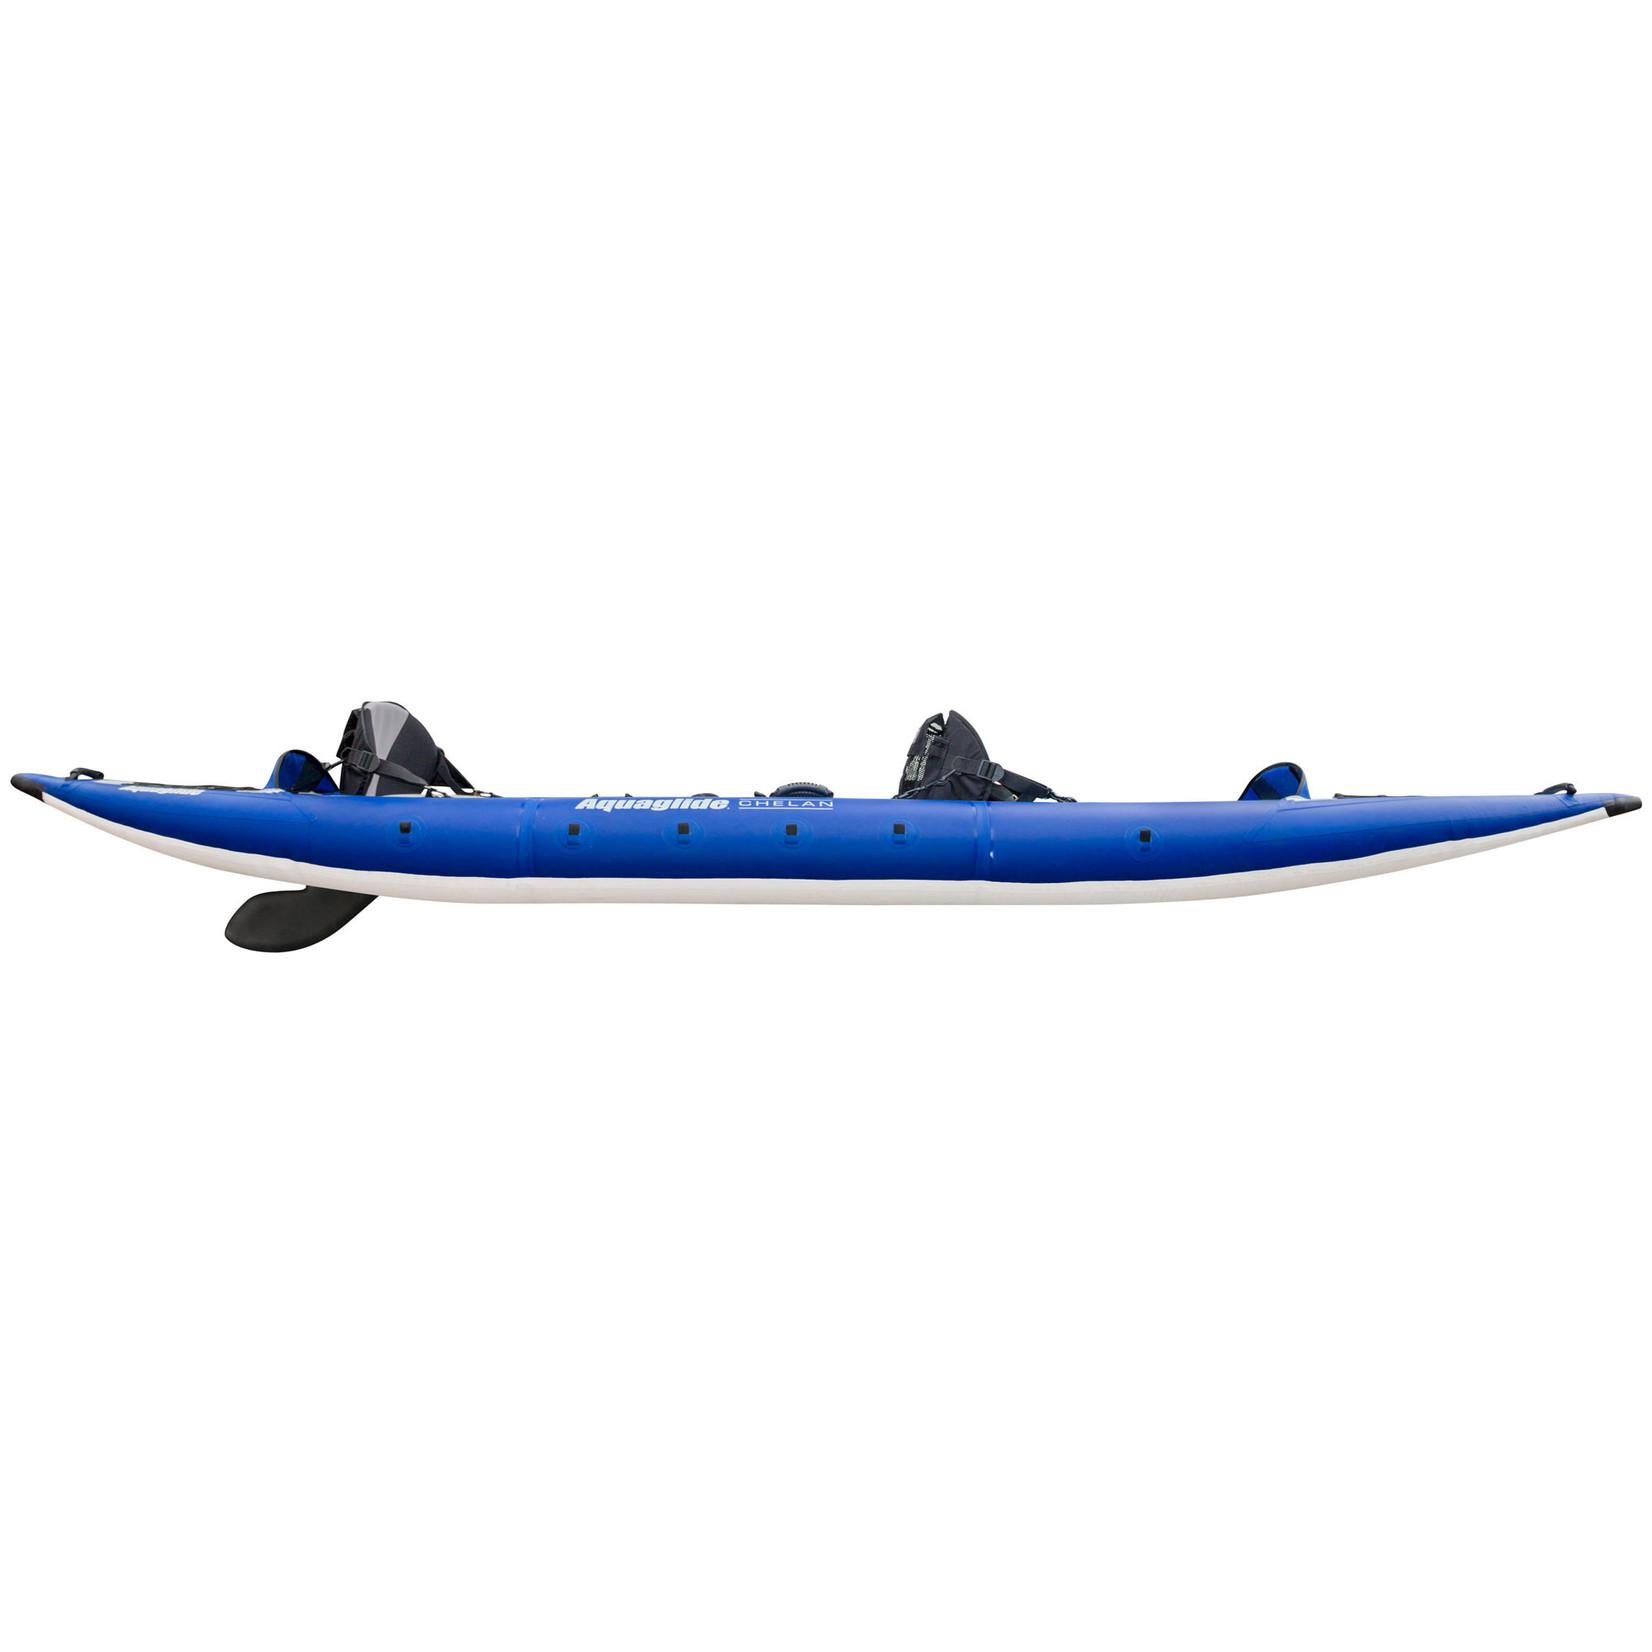 Aquaglide  Chelan 155 HB  - Opblaasbare Kajak